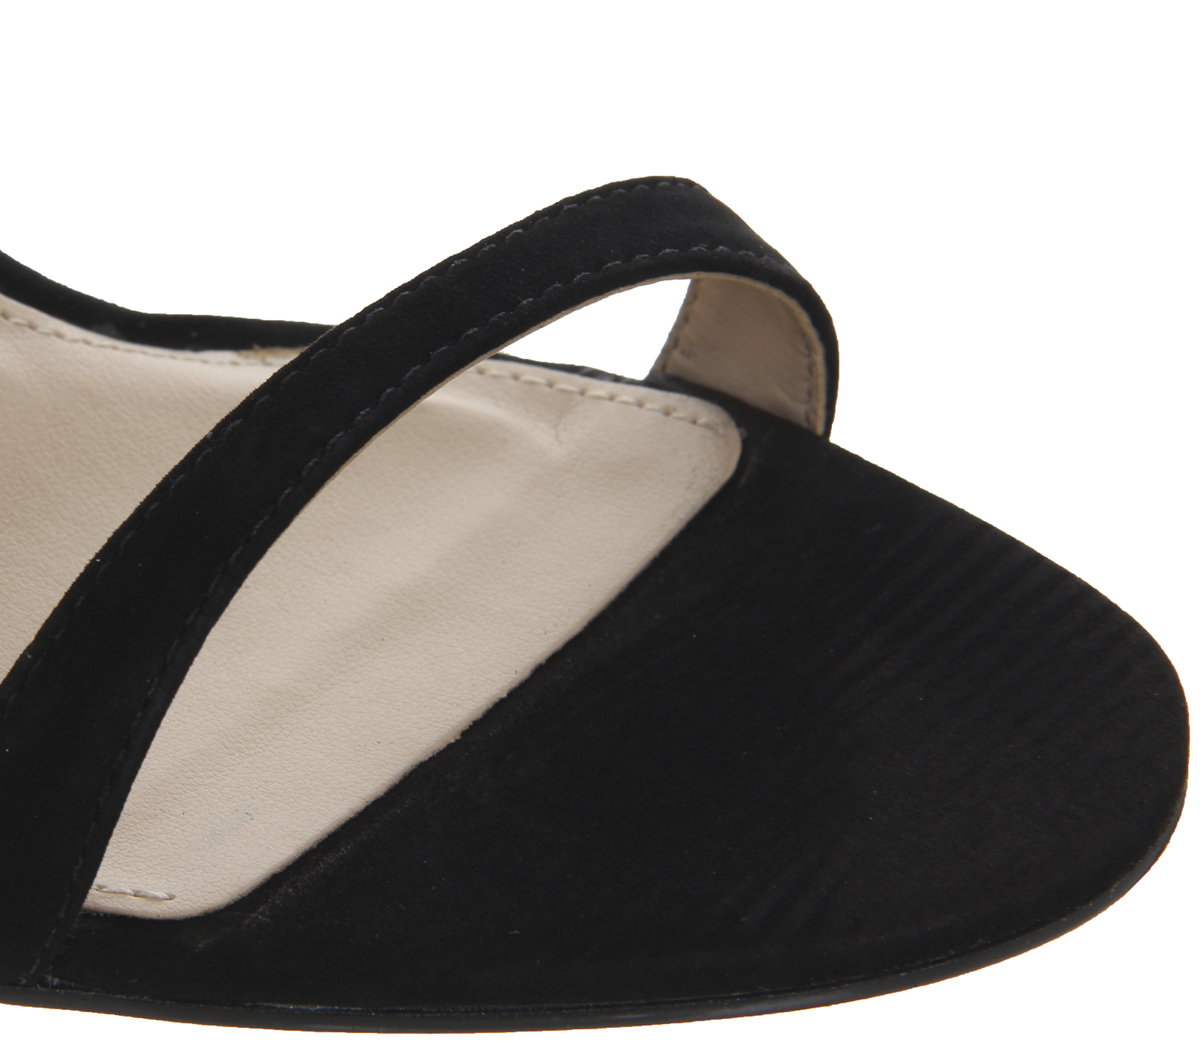 3e6ed6f2f64 Details about Womens Office Happy Metal Heel Sandals Black Nubuck Heels